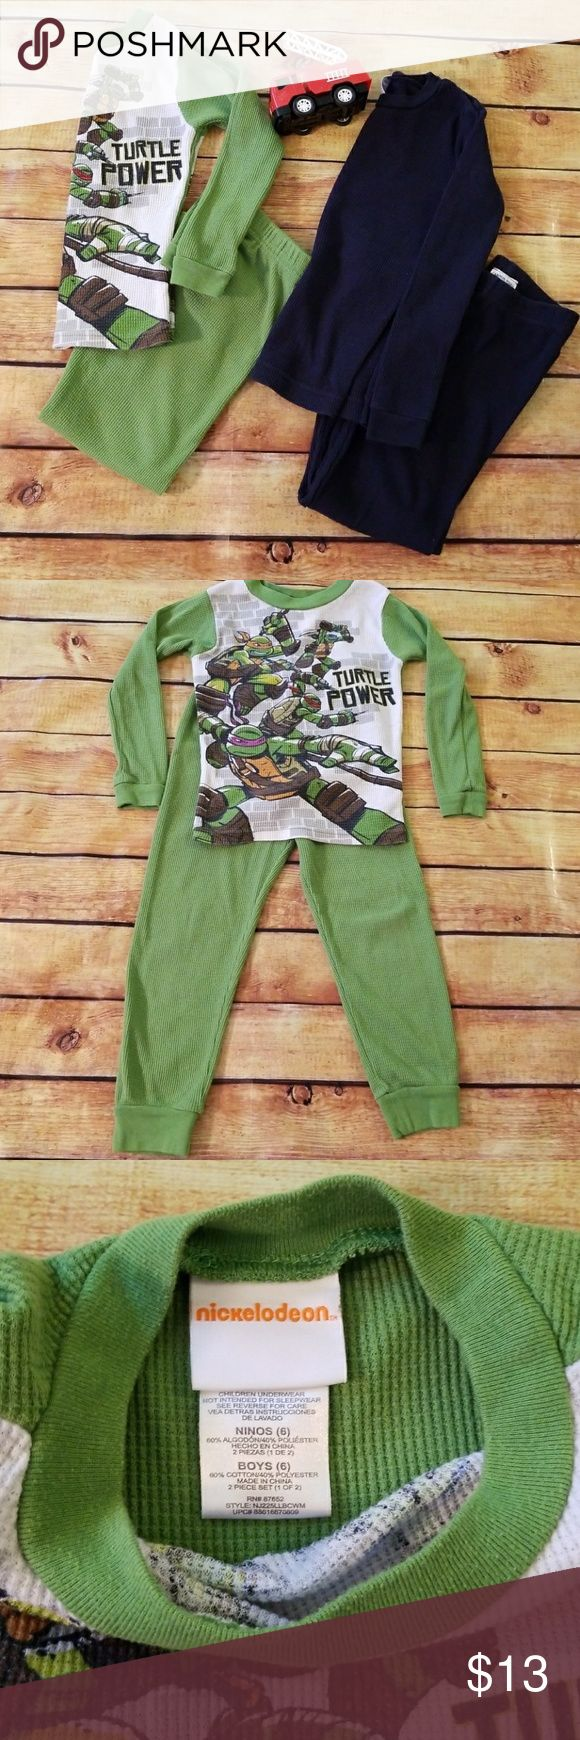 👦Boys Bundle of Thermal Pajamas, Size 6 TMNT Green Thermal pajamas(Nickelodeon) and Canyon River Blues navy blue thermal pajamas. Both size 6. Pre-loved❤ Nickelodeon Pajamas Pajama Sets